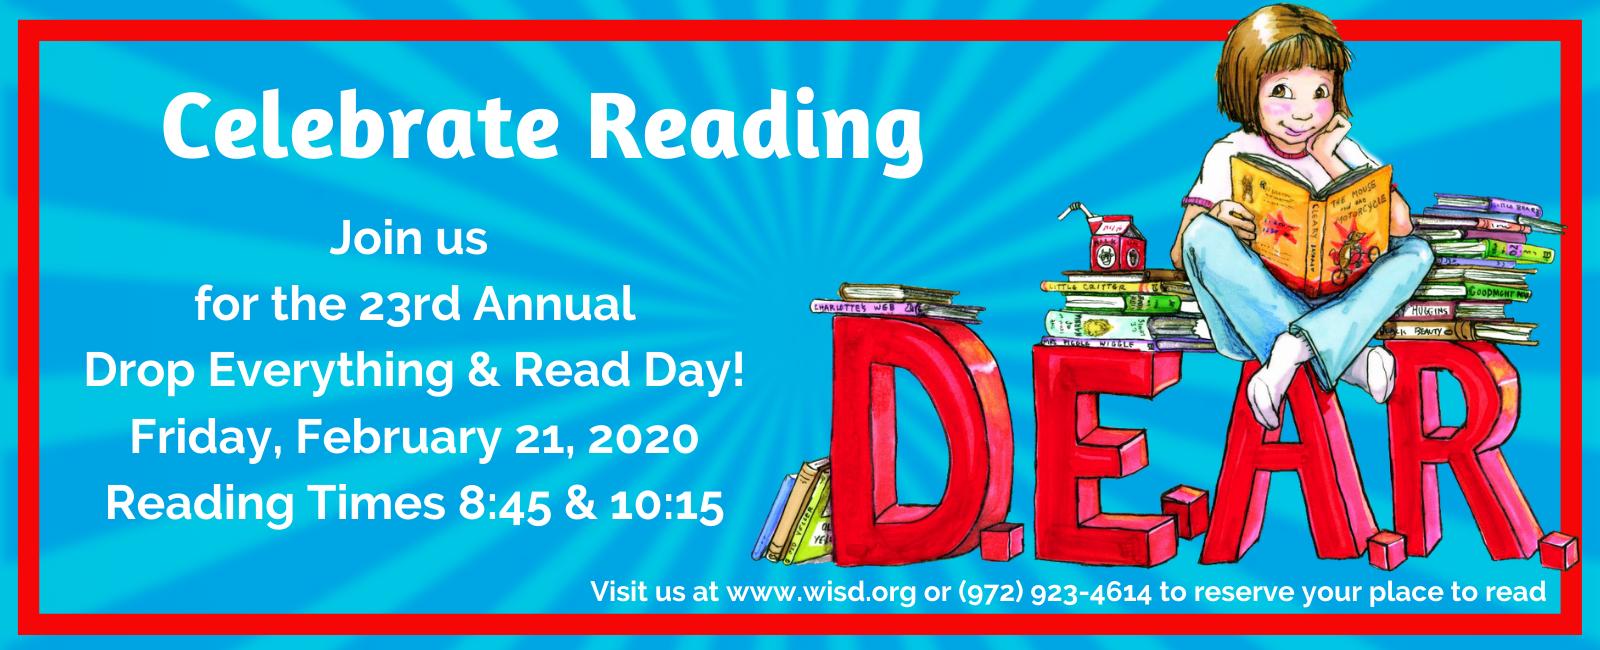 The DEAR Day mascot, Ramona, with books